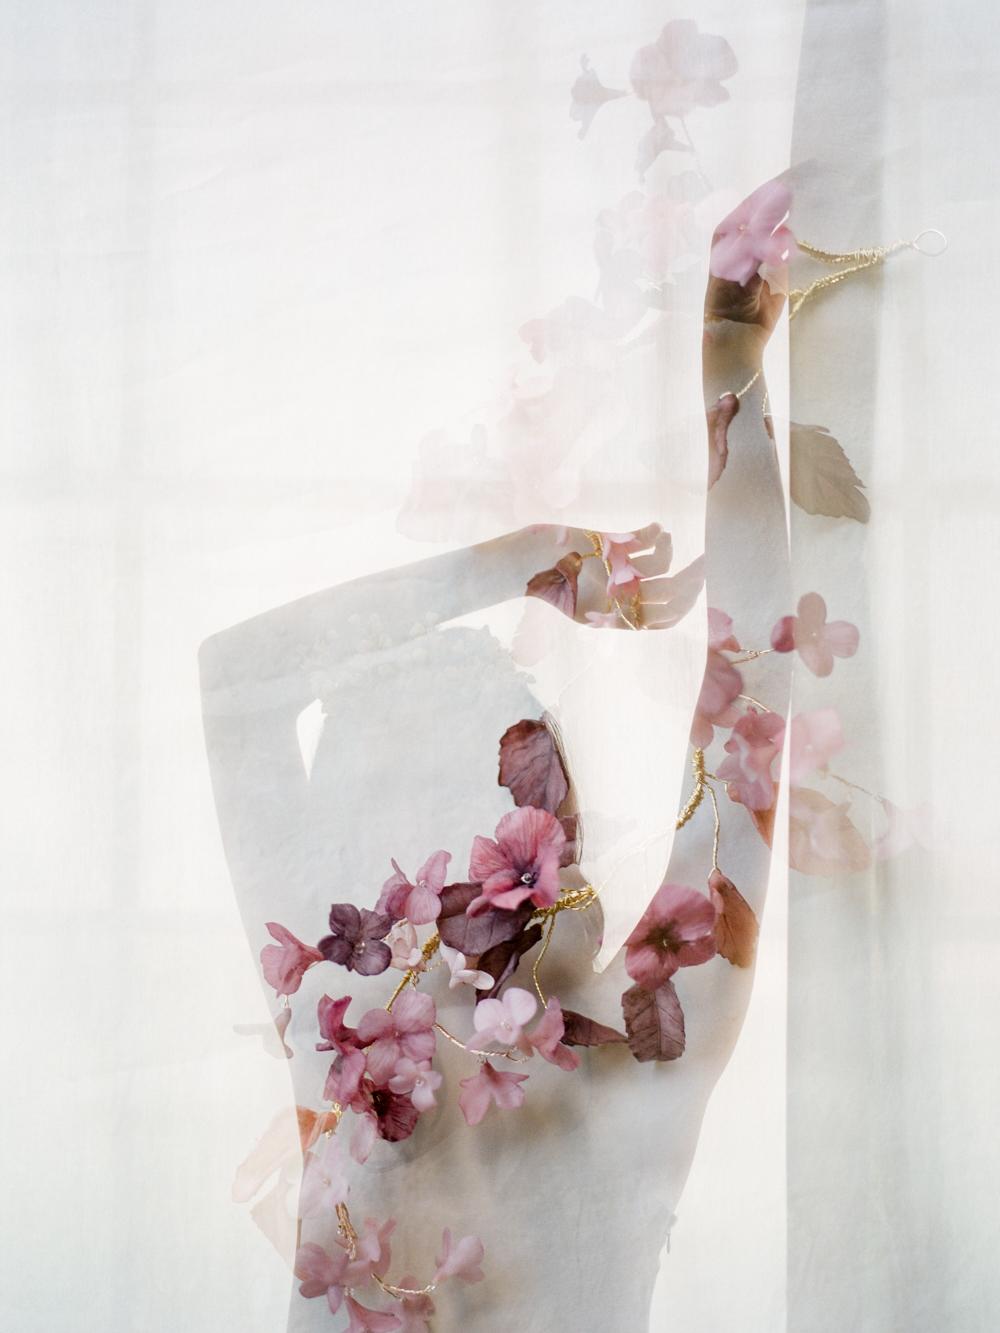 Christine Gosch - Erin Rhyne - film photographer - brand photographer - portrait photographer-11.jpg